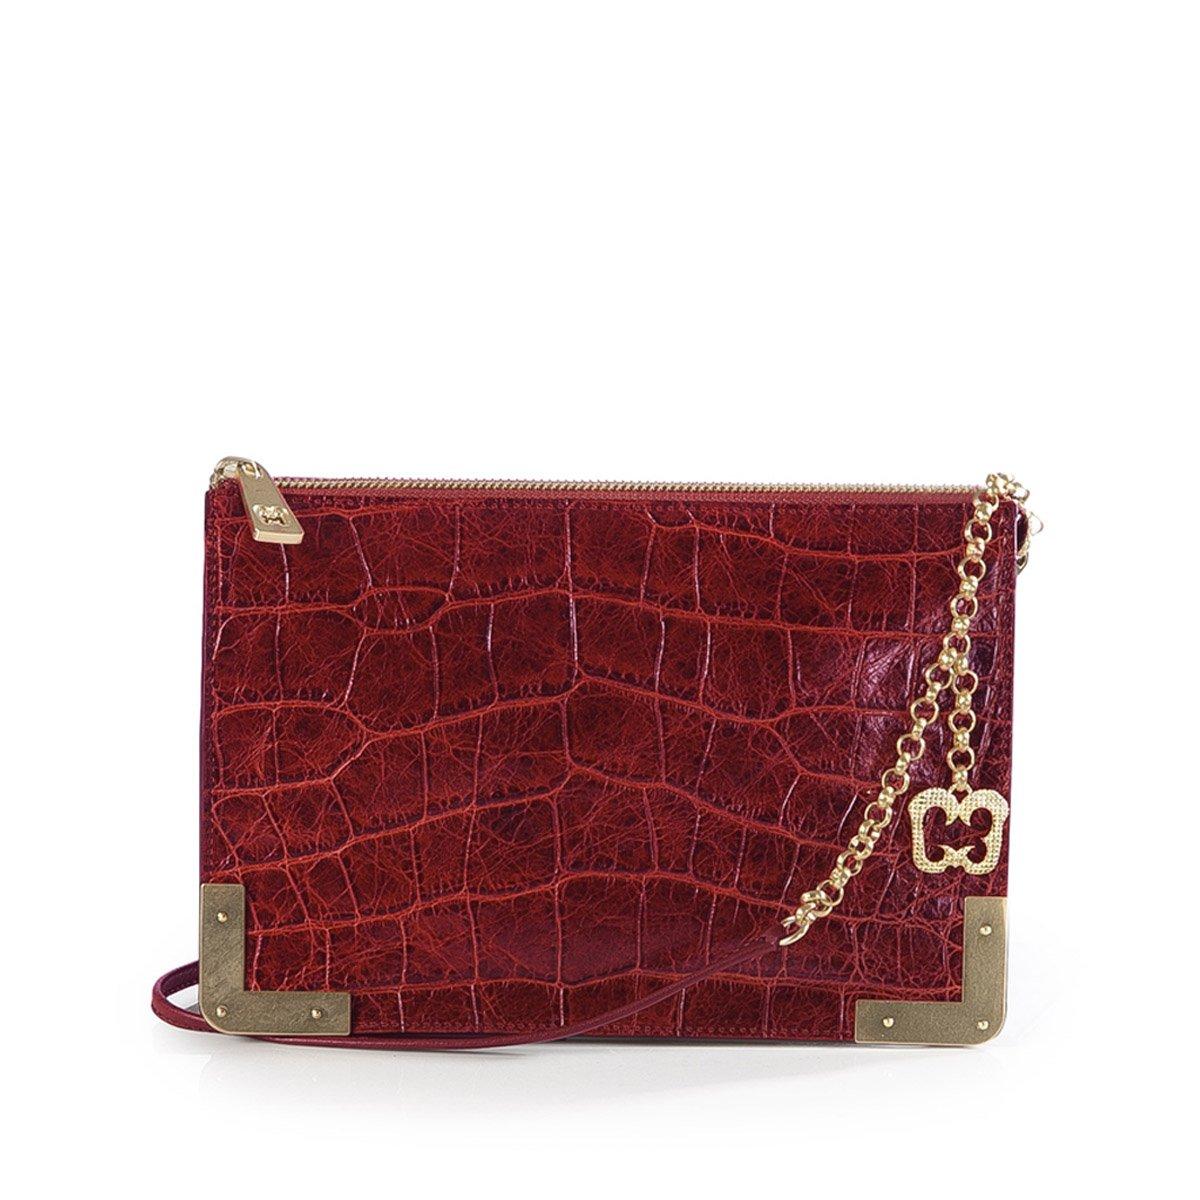 Eric Javits Luxury Fashion Designer Women's Handbag - Perkins II - Red